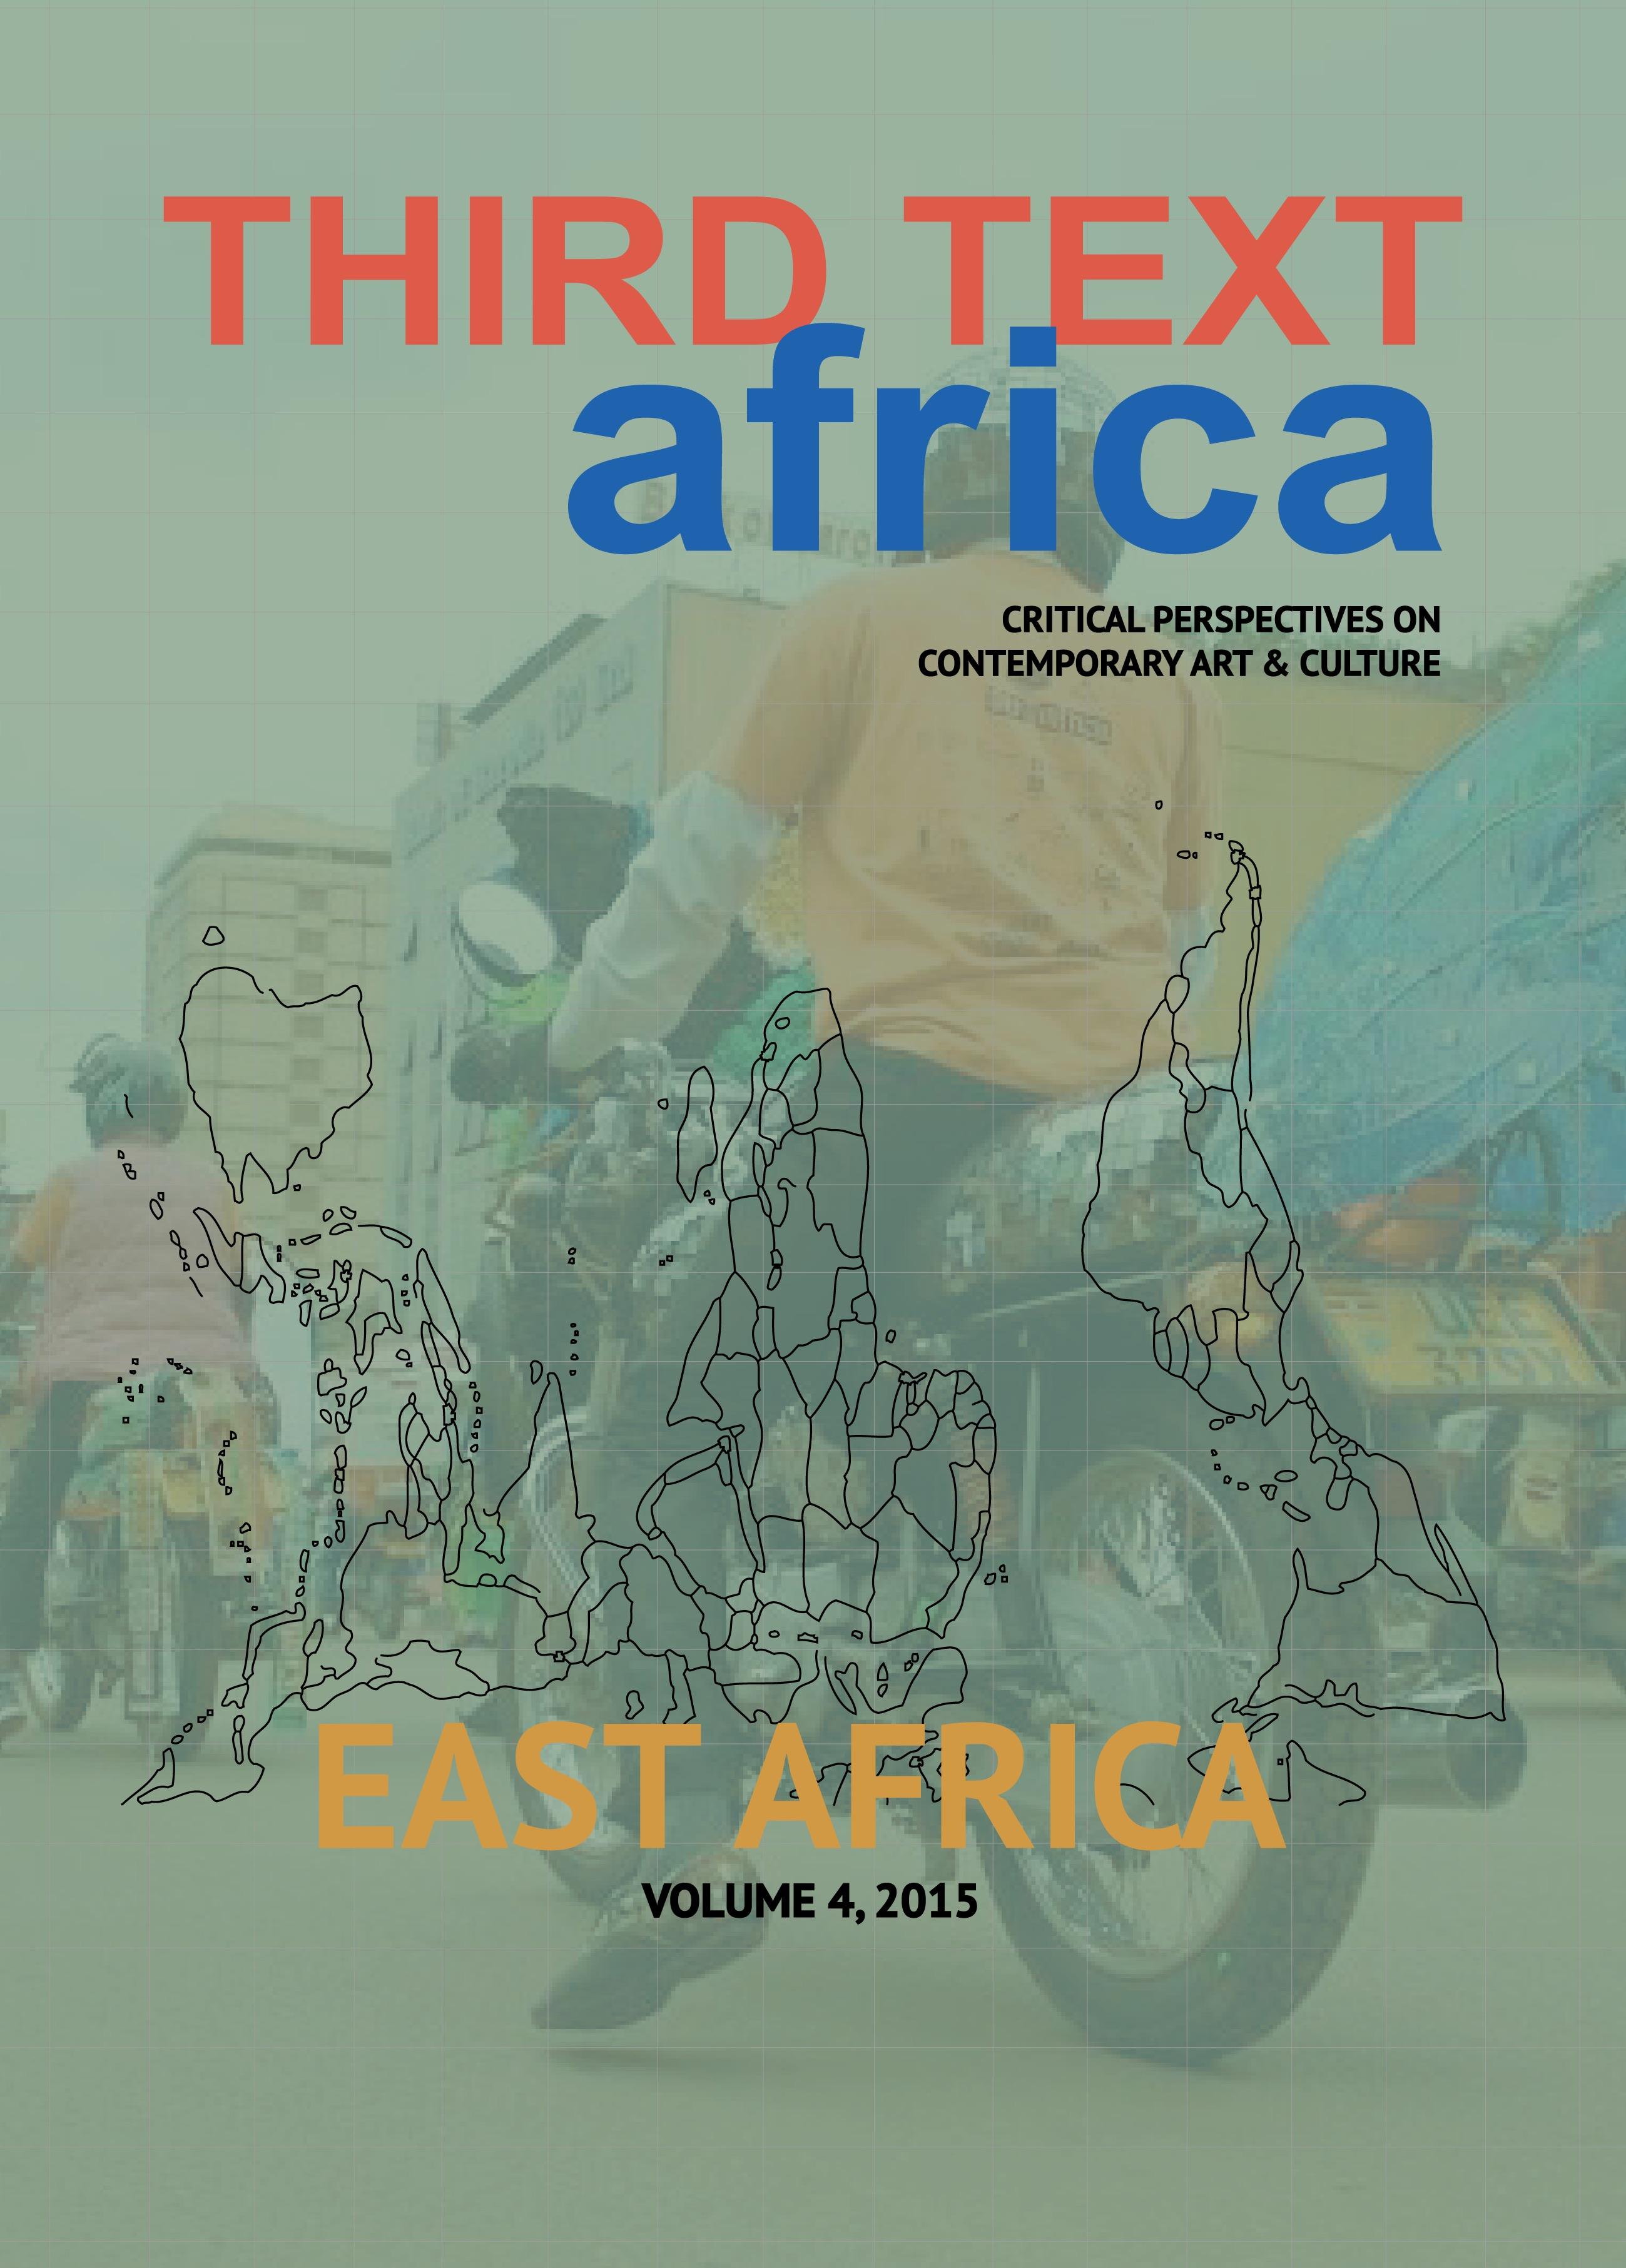 TTA EAST AFRICA